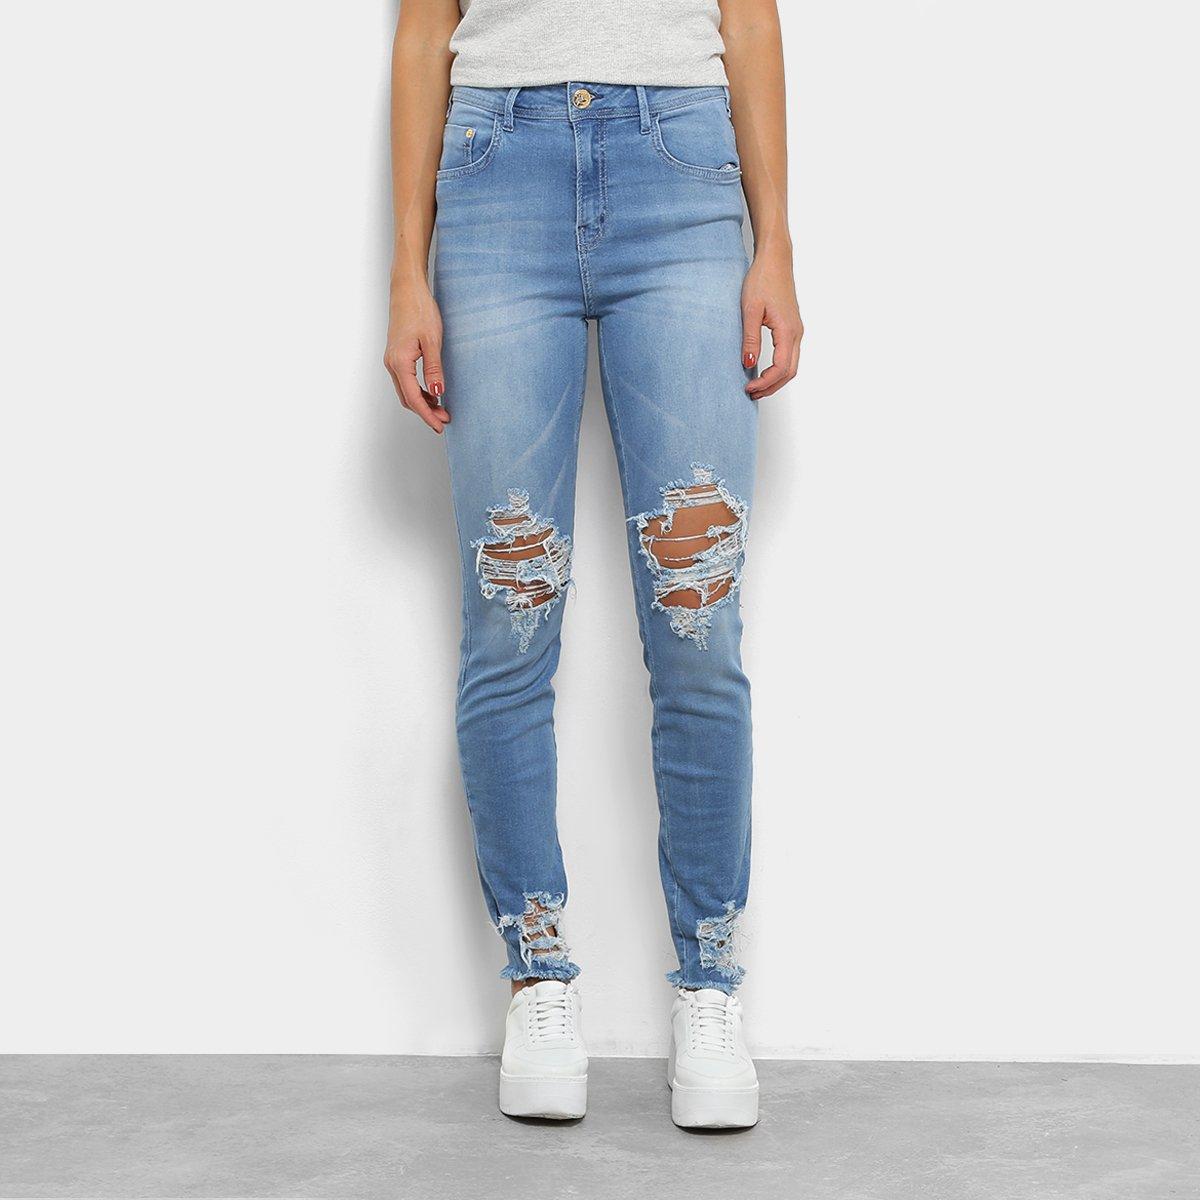 c2104746b Calça Jeans Skinny Coca-Cola High Destroyed Cintura Alta Feminina